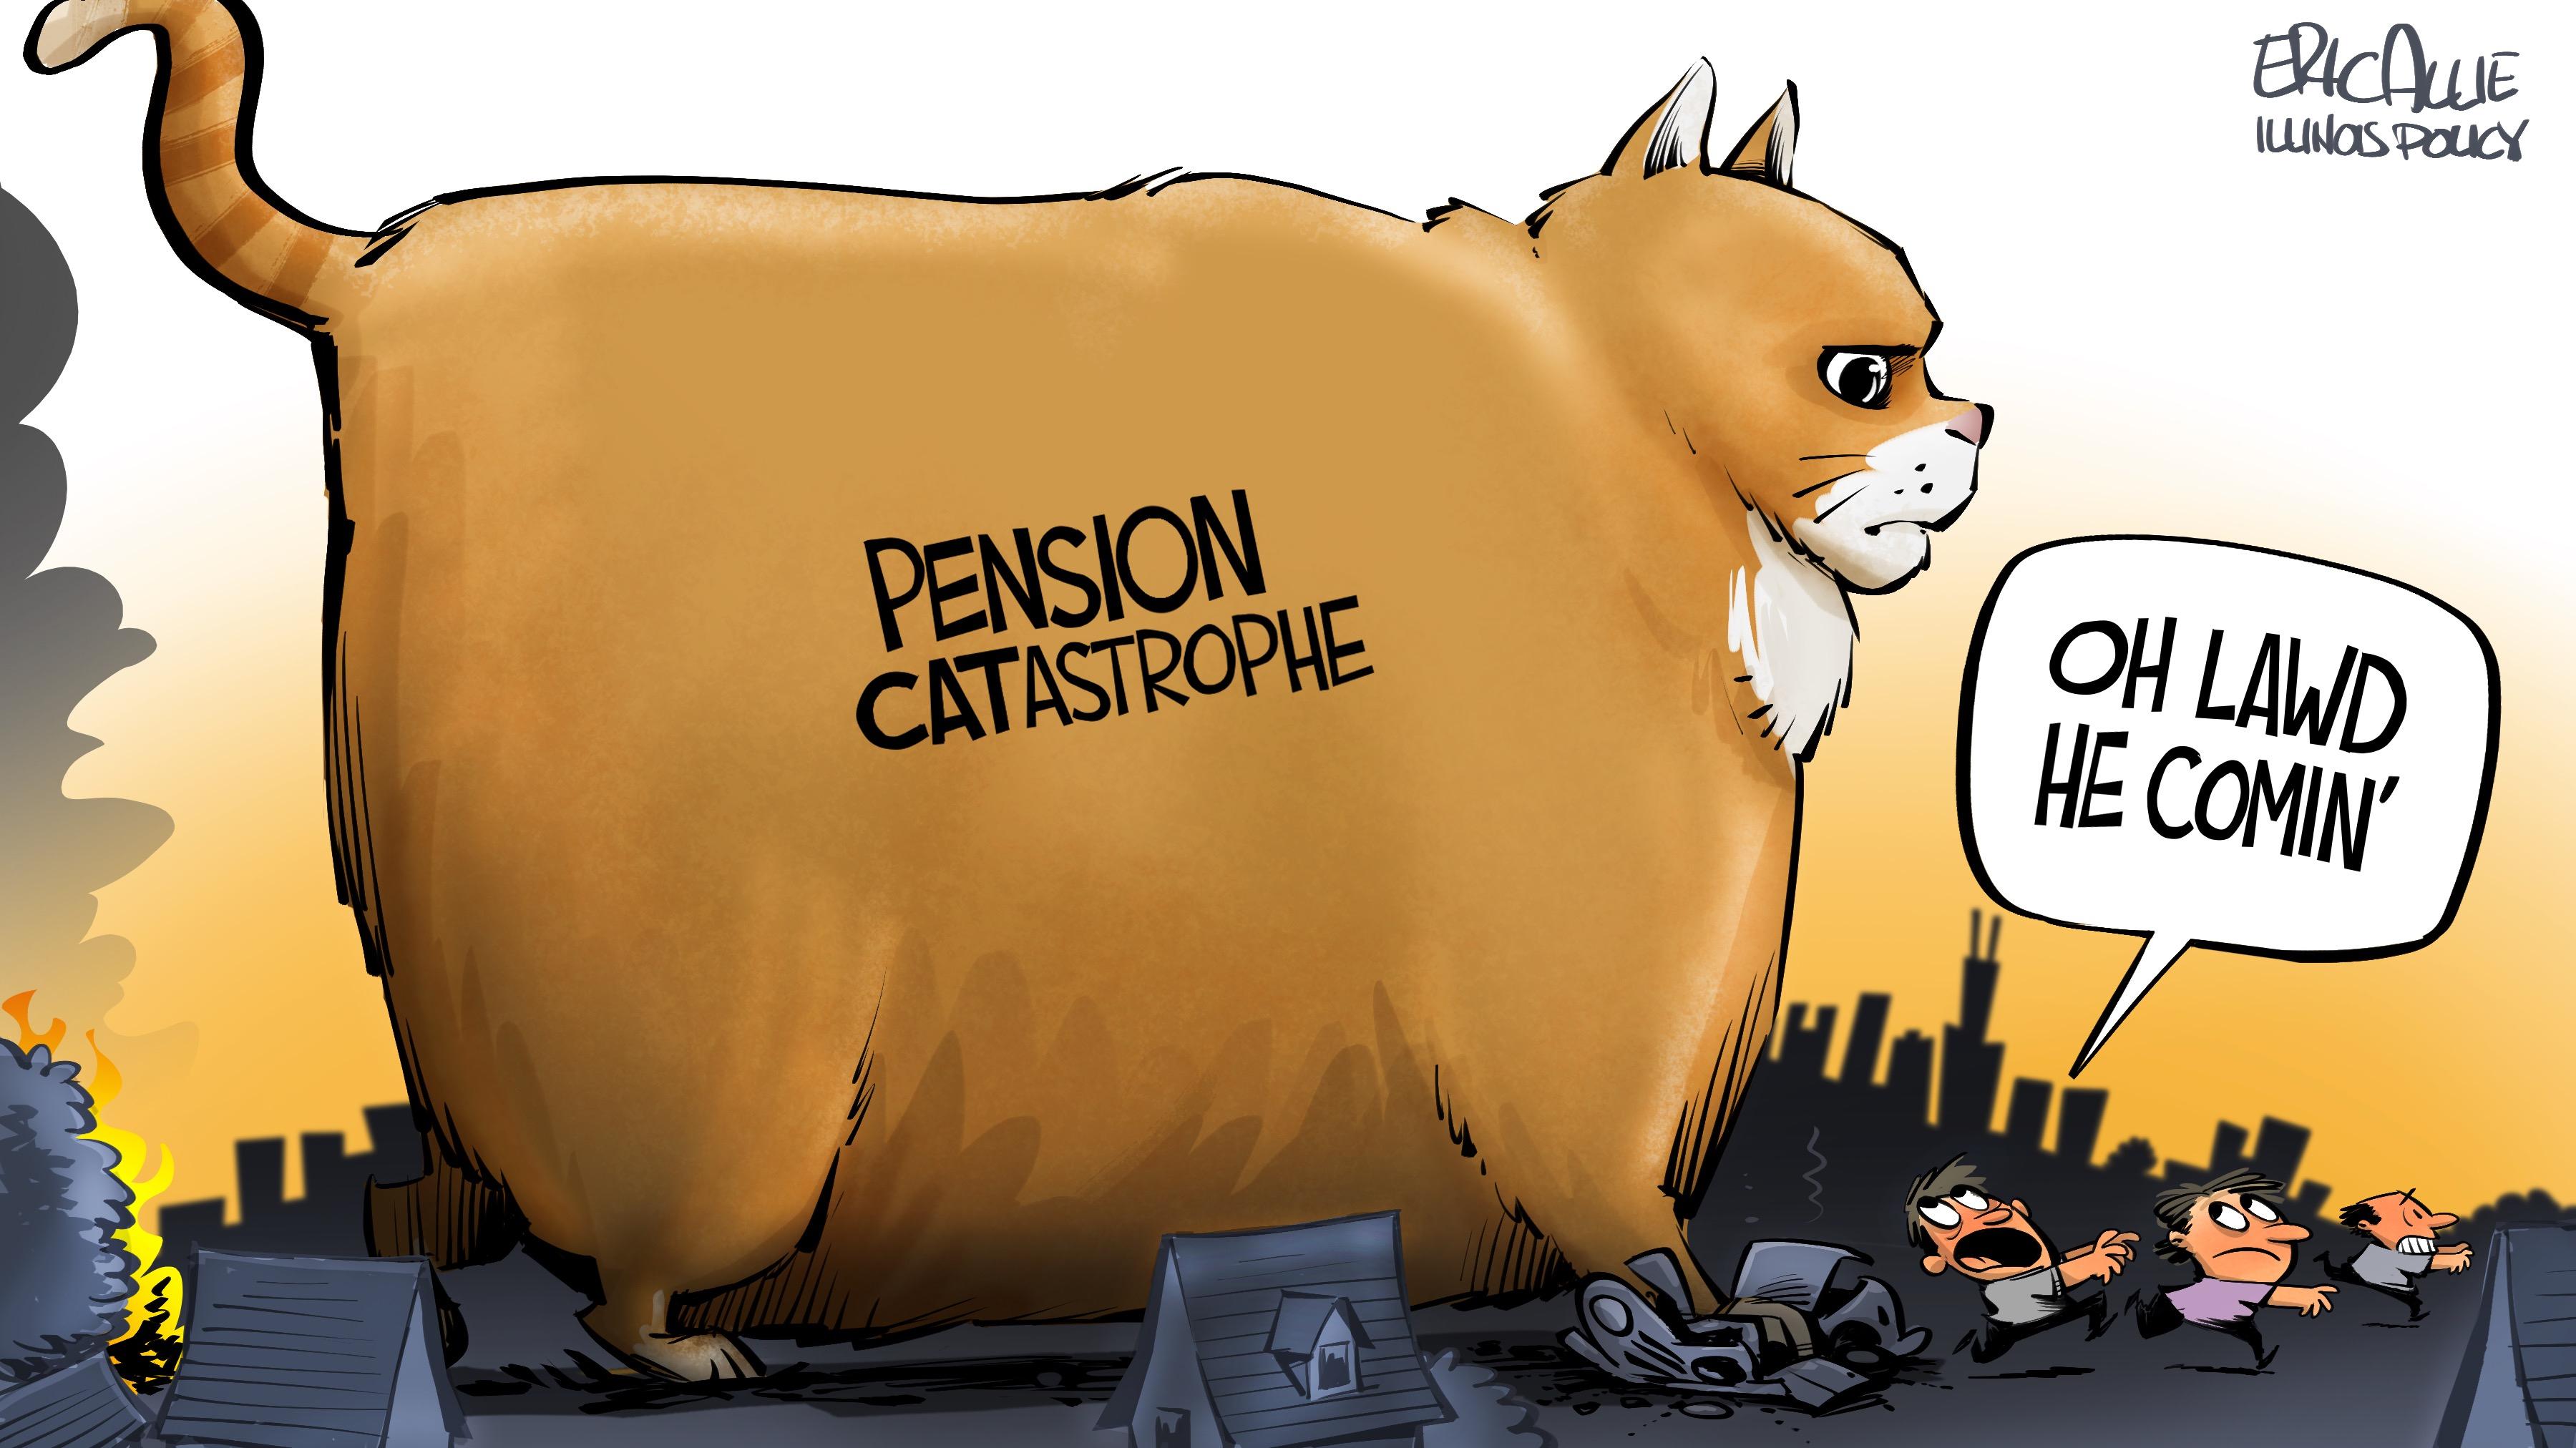 Pension CATastrophe chonker